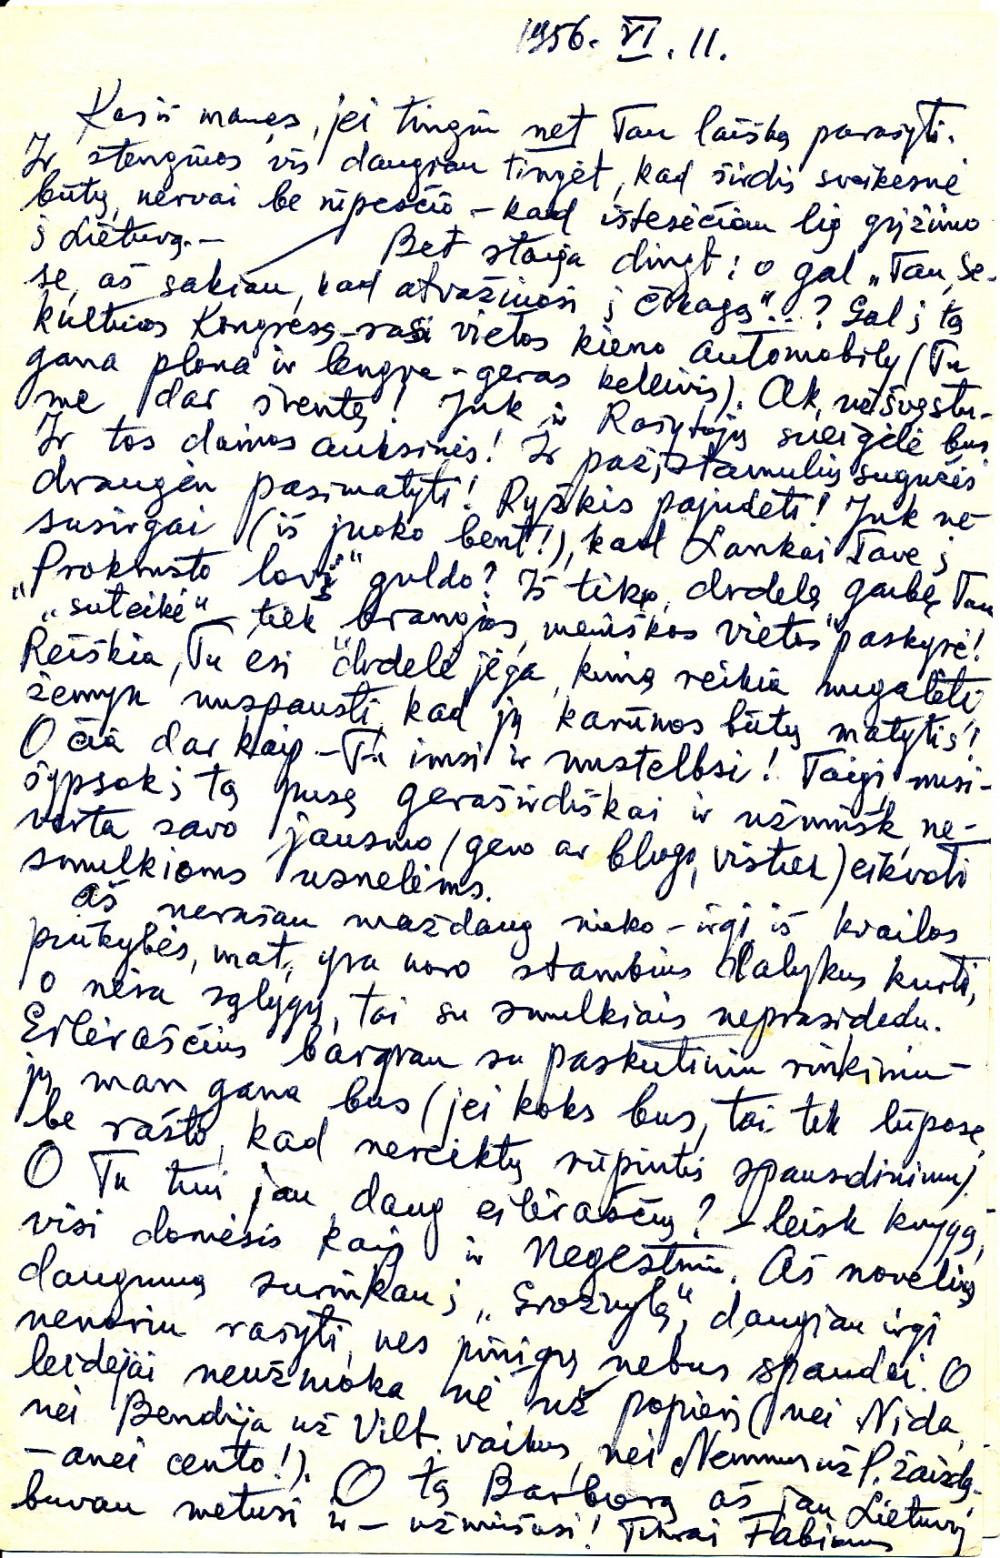 P. Orintaitės laiškas N. Mazalaitei